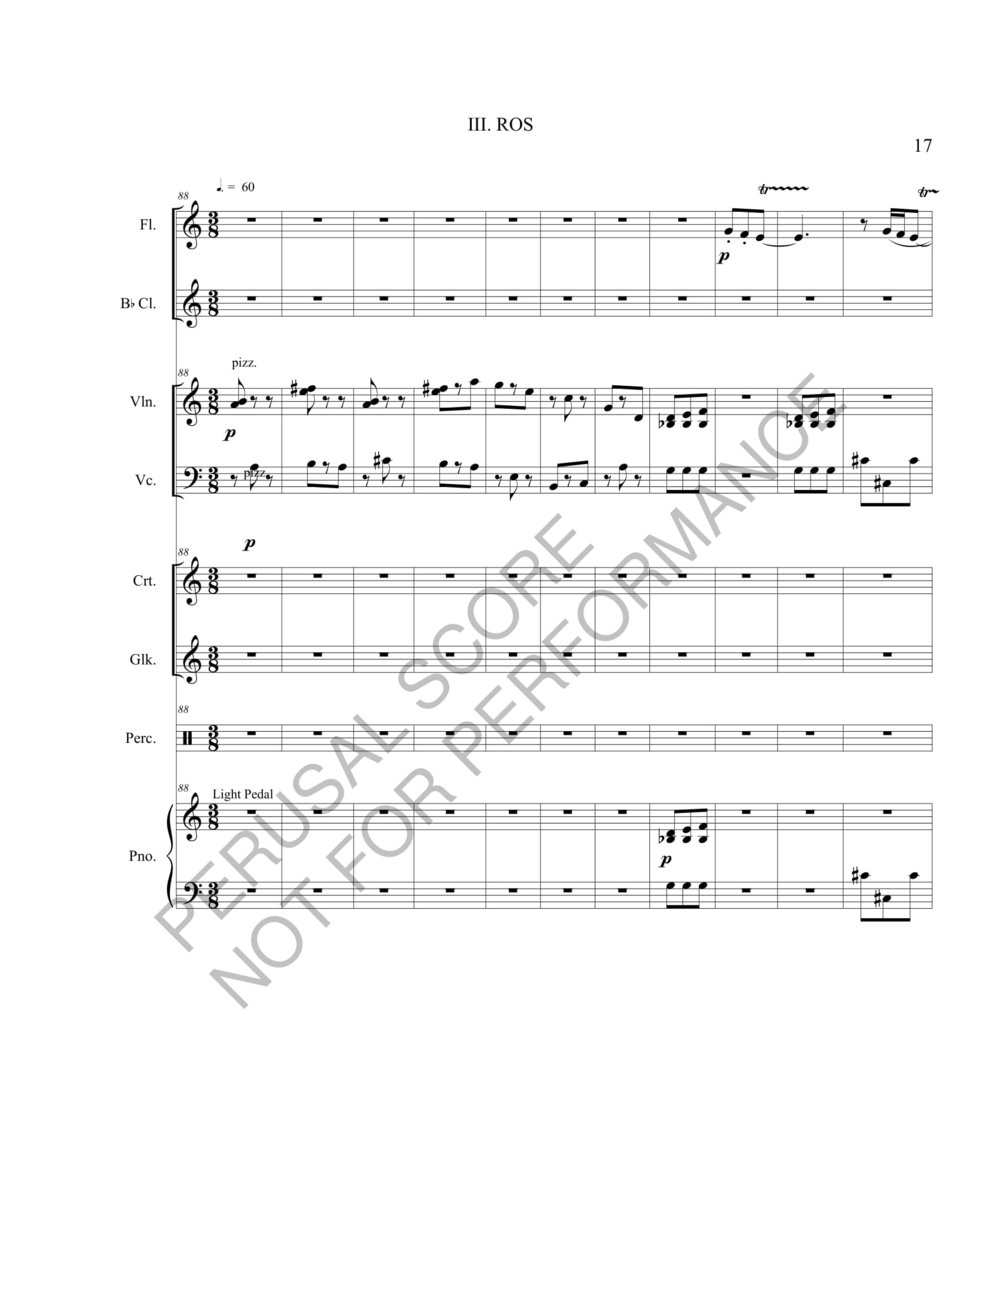 Boyd Terra Liberi Score-watermark-23.jpg